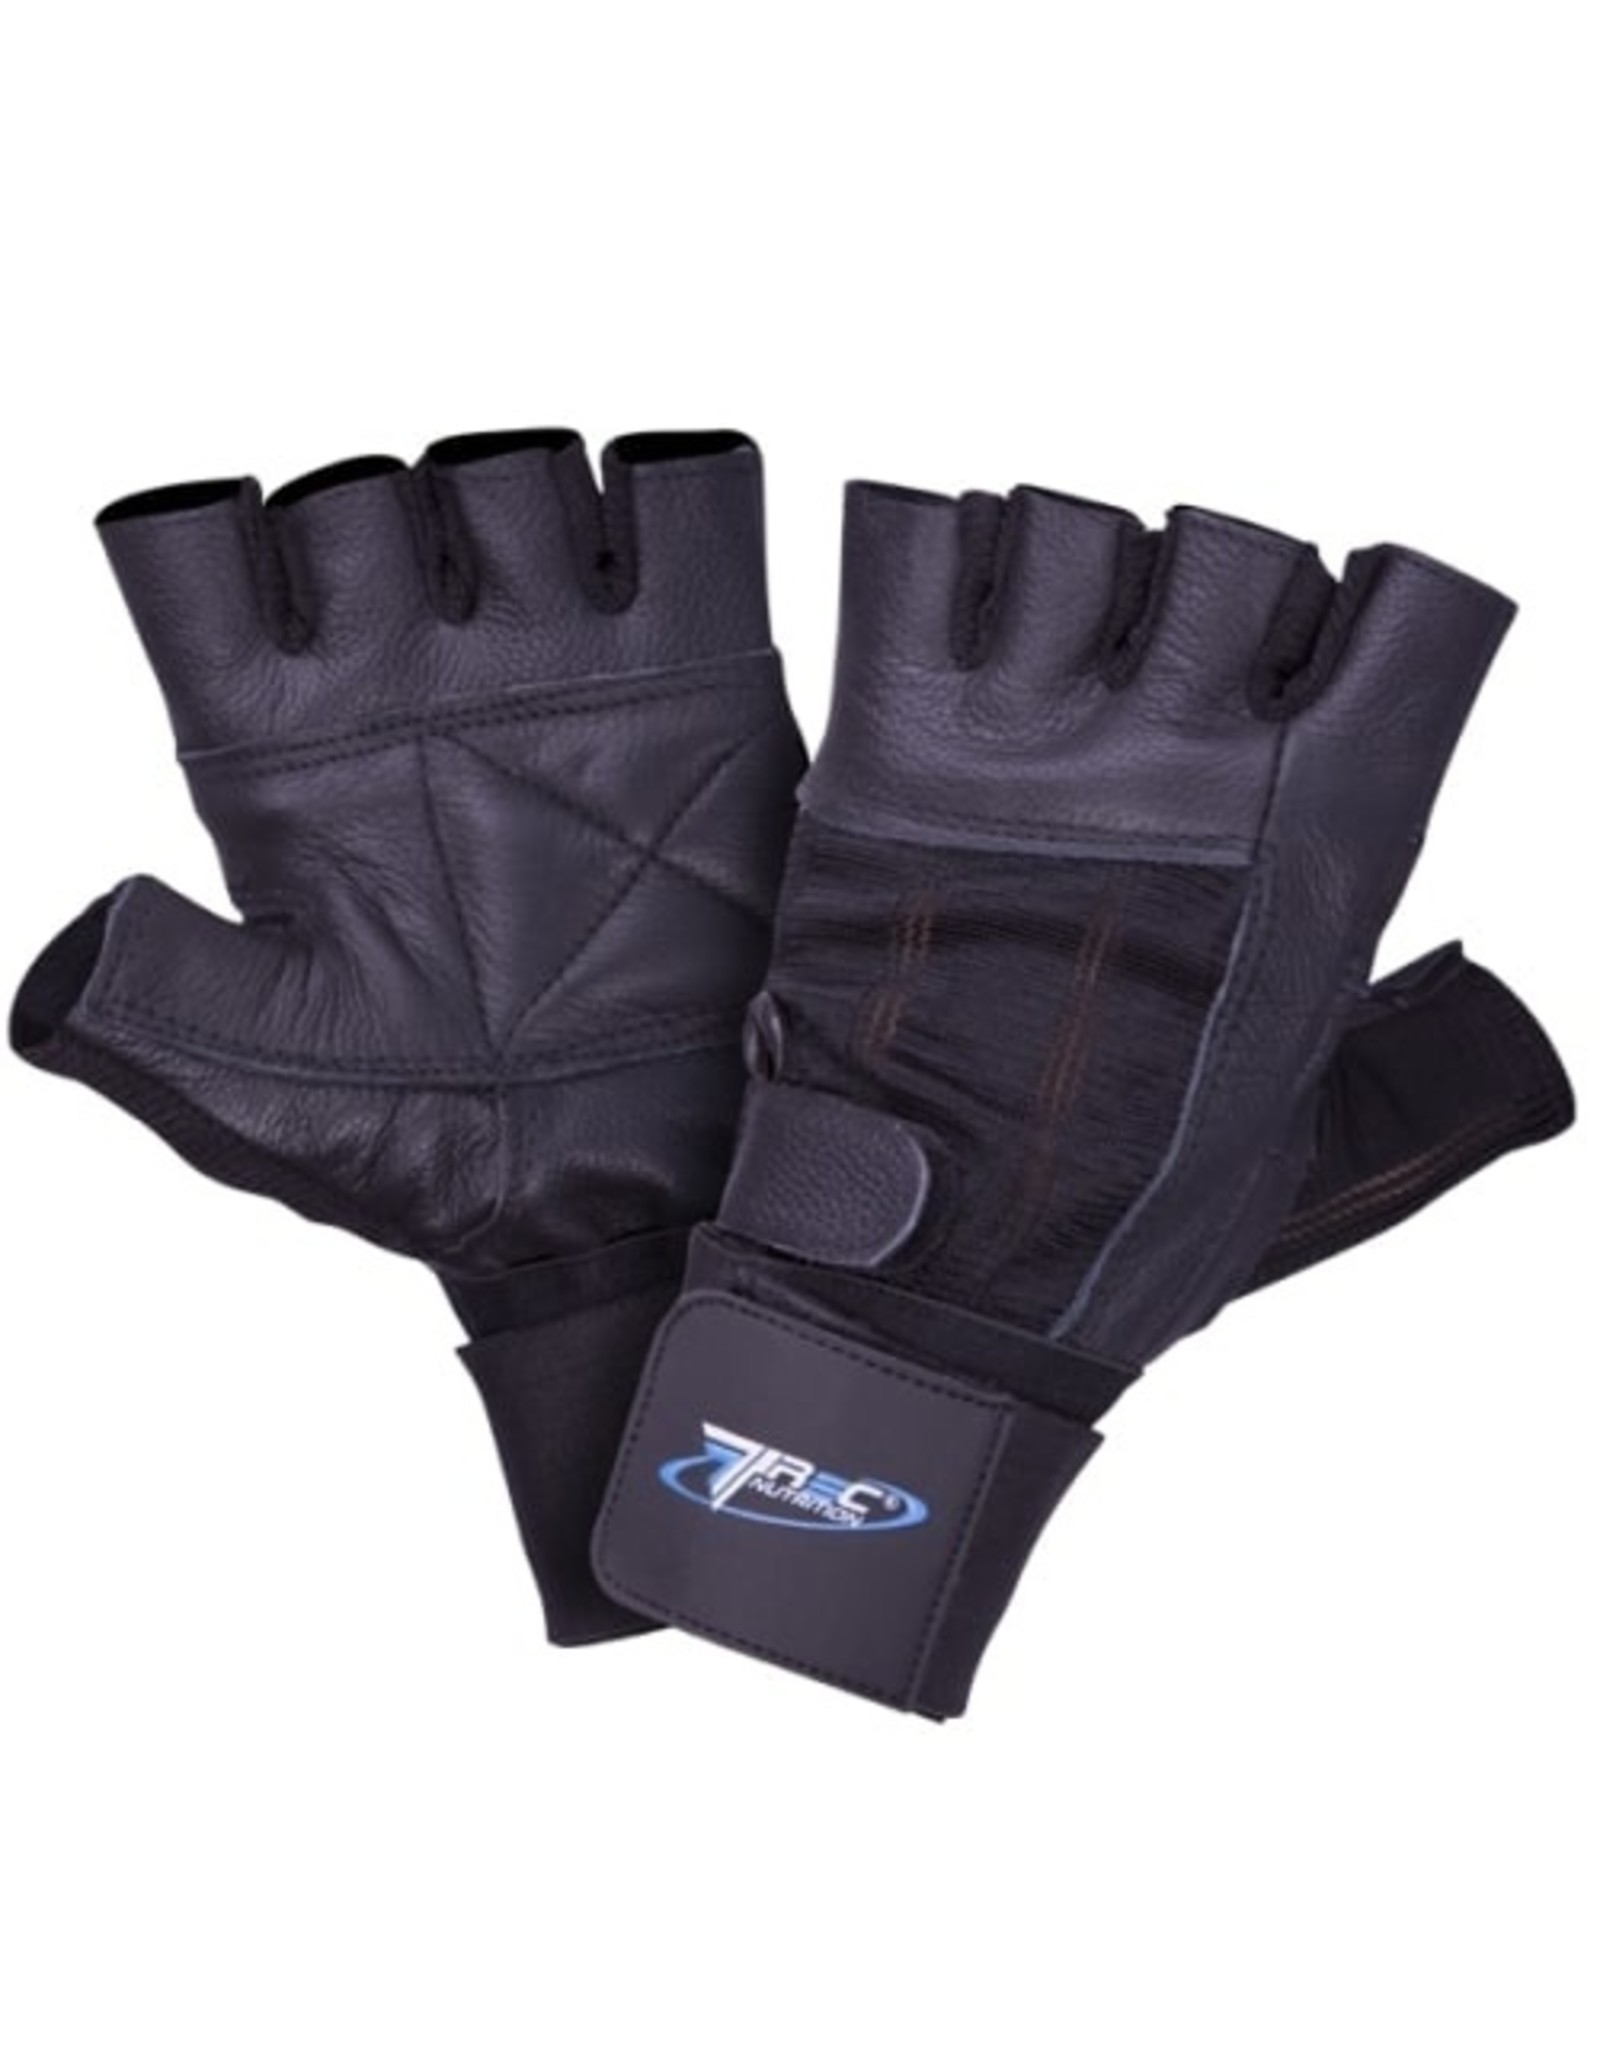 TREC NUTRITION Classic gloves - Stripe black